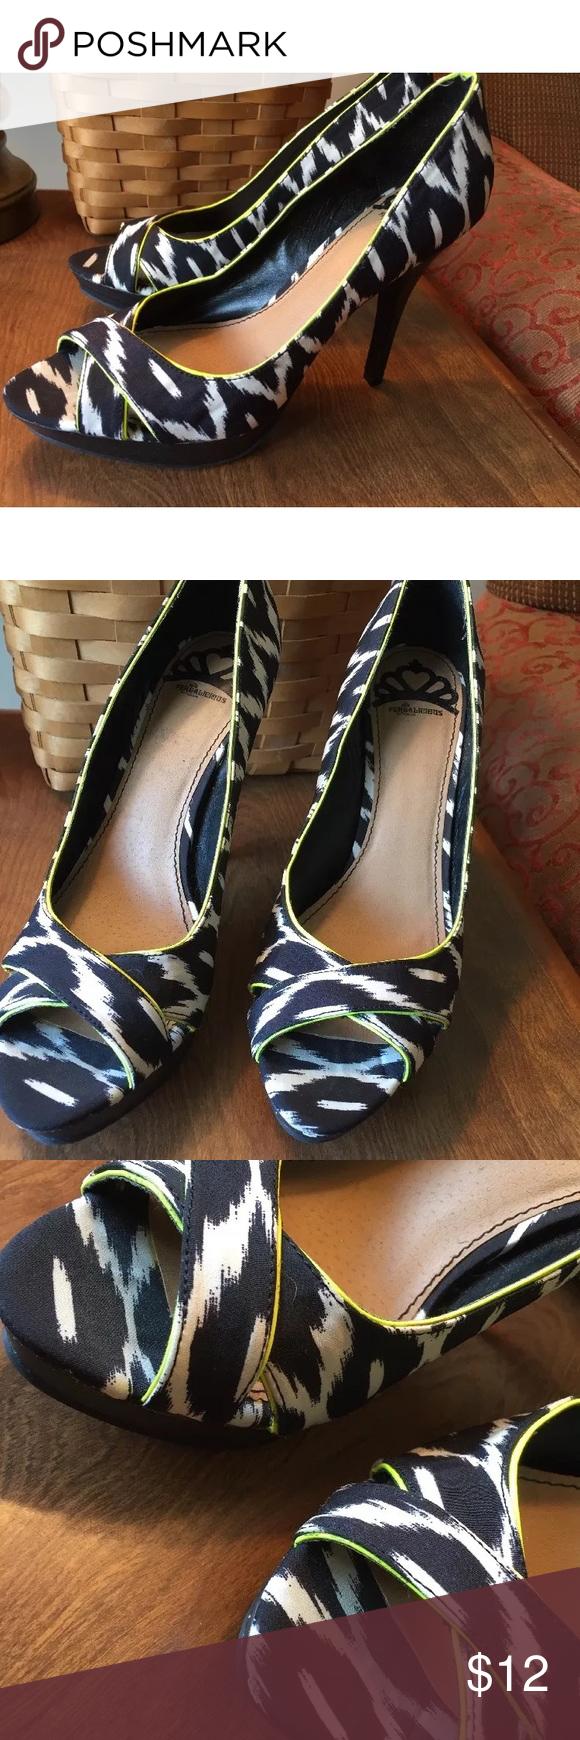 491517ab794 Black white neon platform heels Black White Neon trim Open Toe High Heels  Platform Shoes Sz